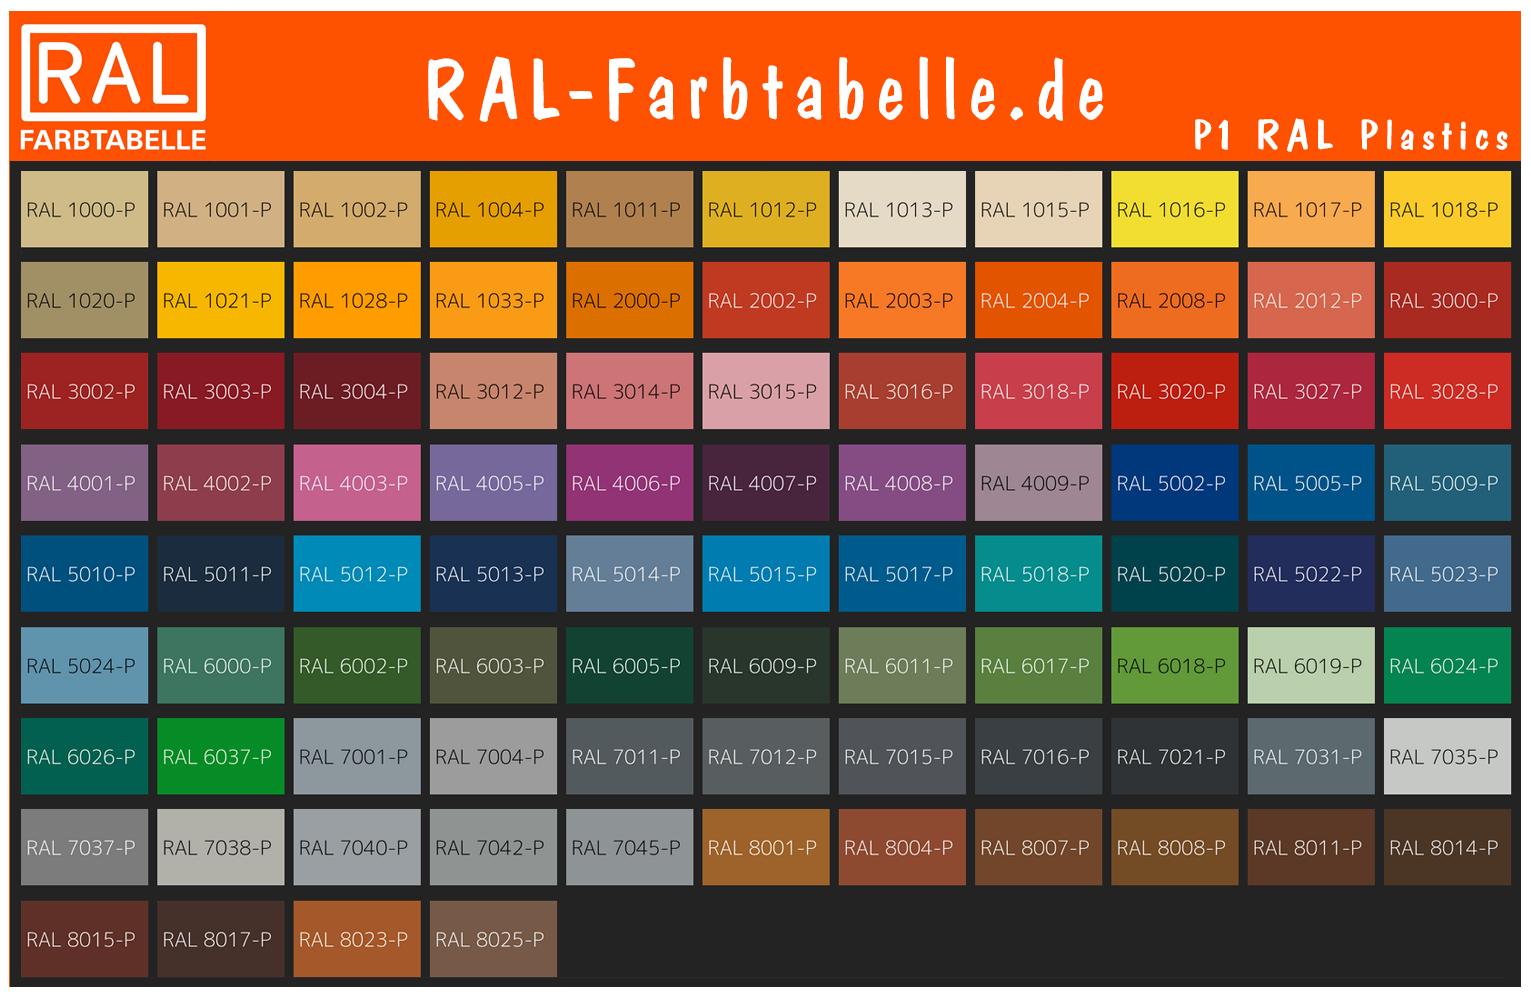 P1 RAL Plastics Farbtabelle